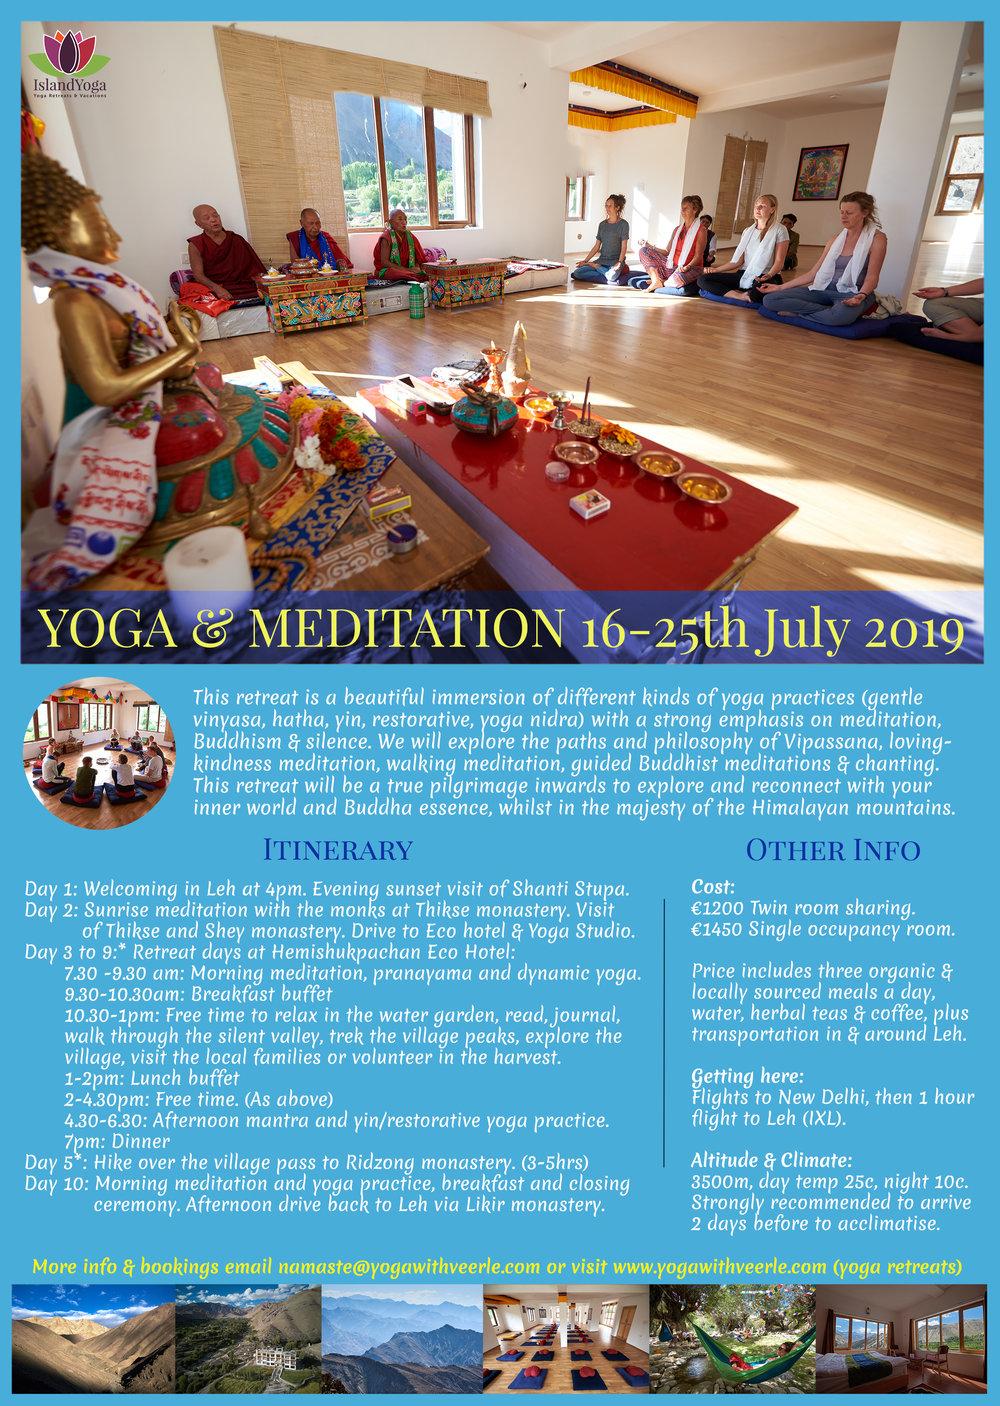 HYR flyer meditation Veerle.jpg